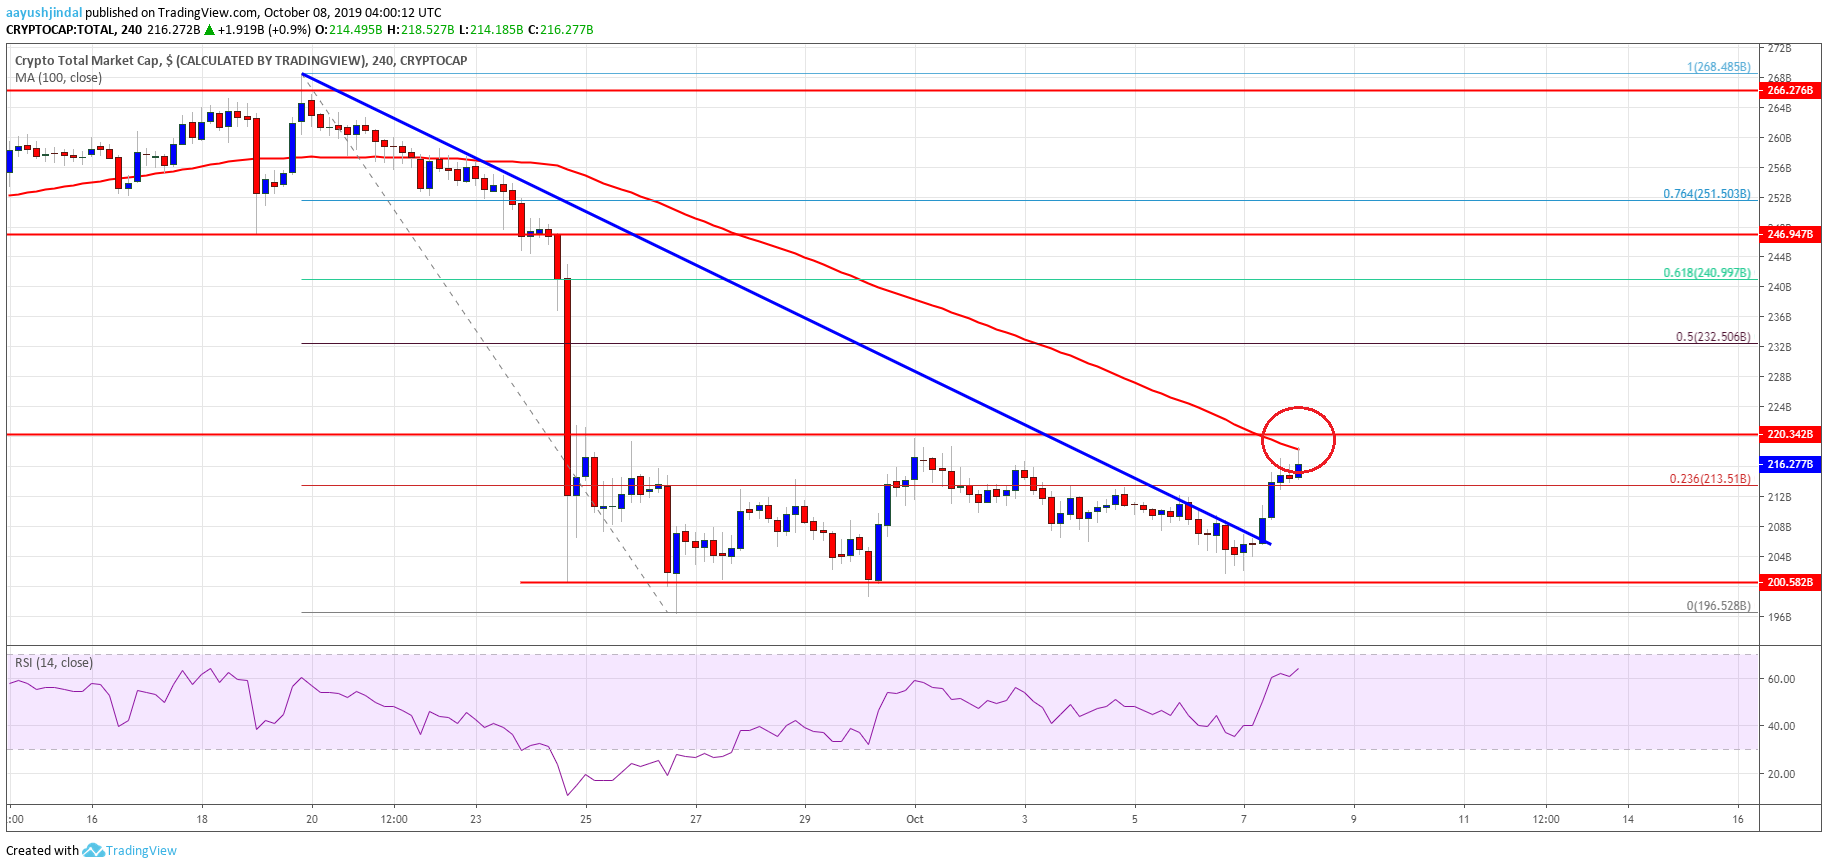 Bitcoin Crypto Market Altcoins ETH XRP EOS BNB TRX ADA LTC